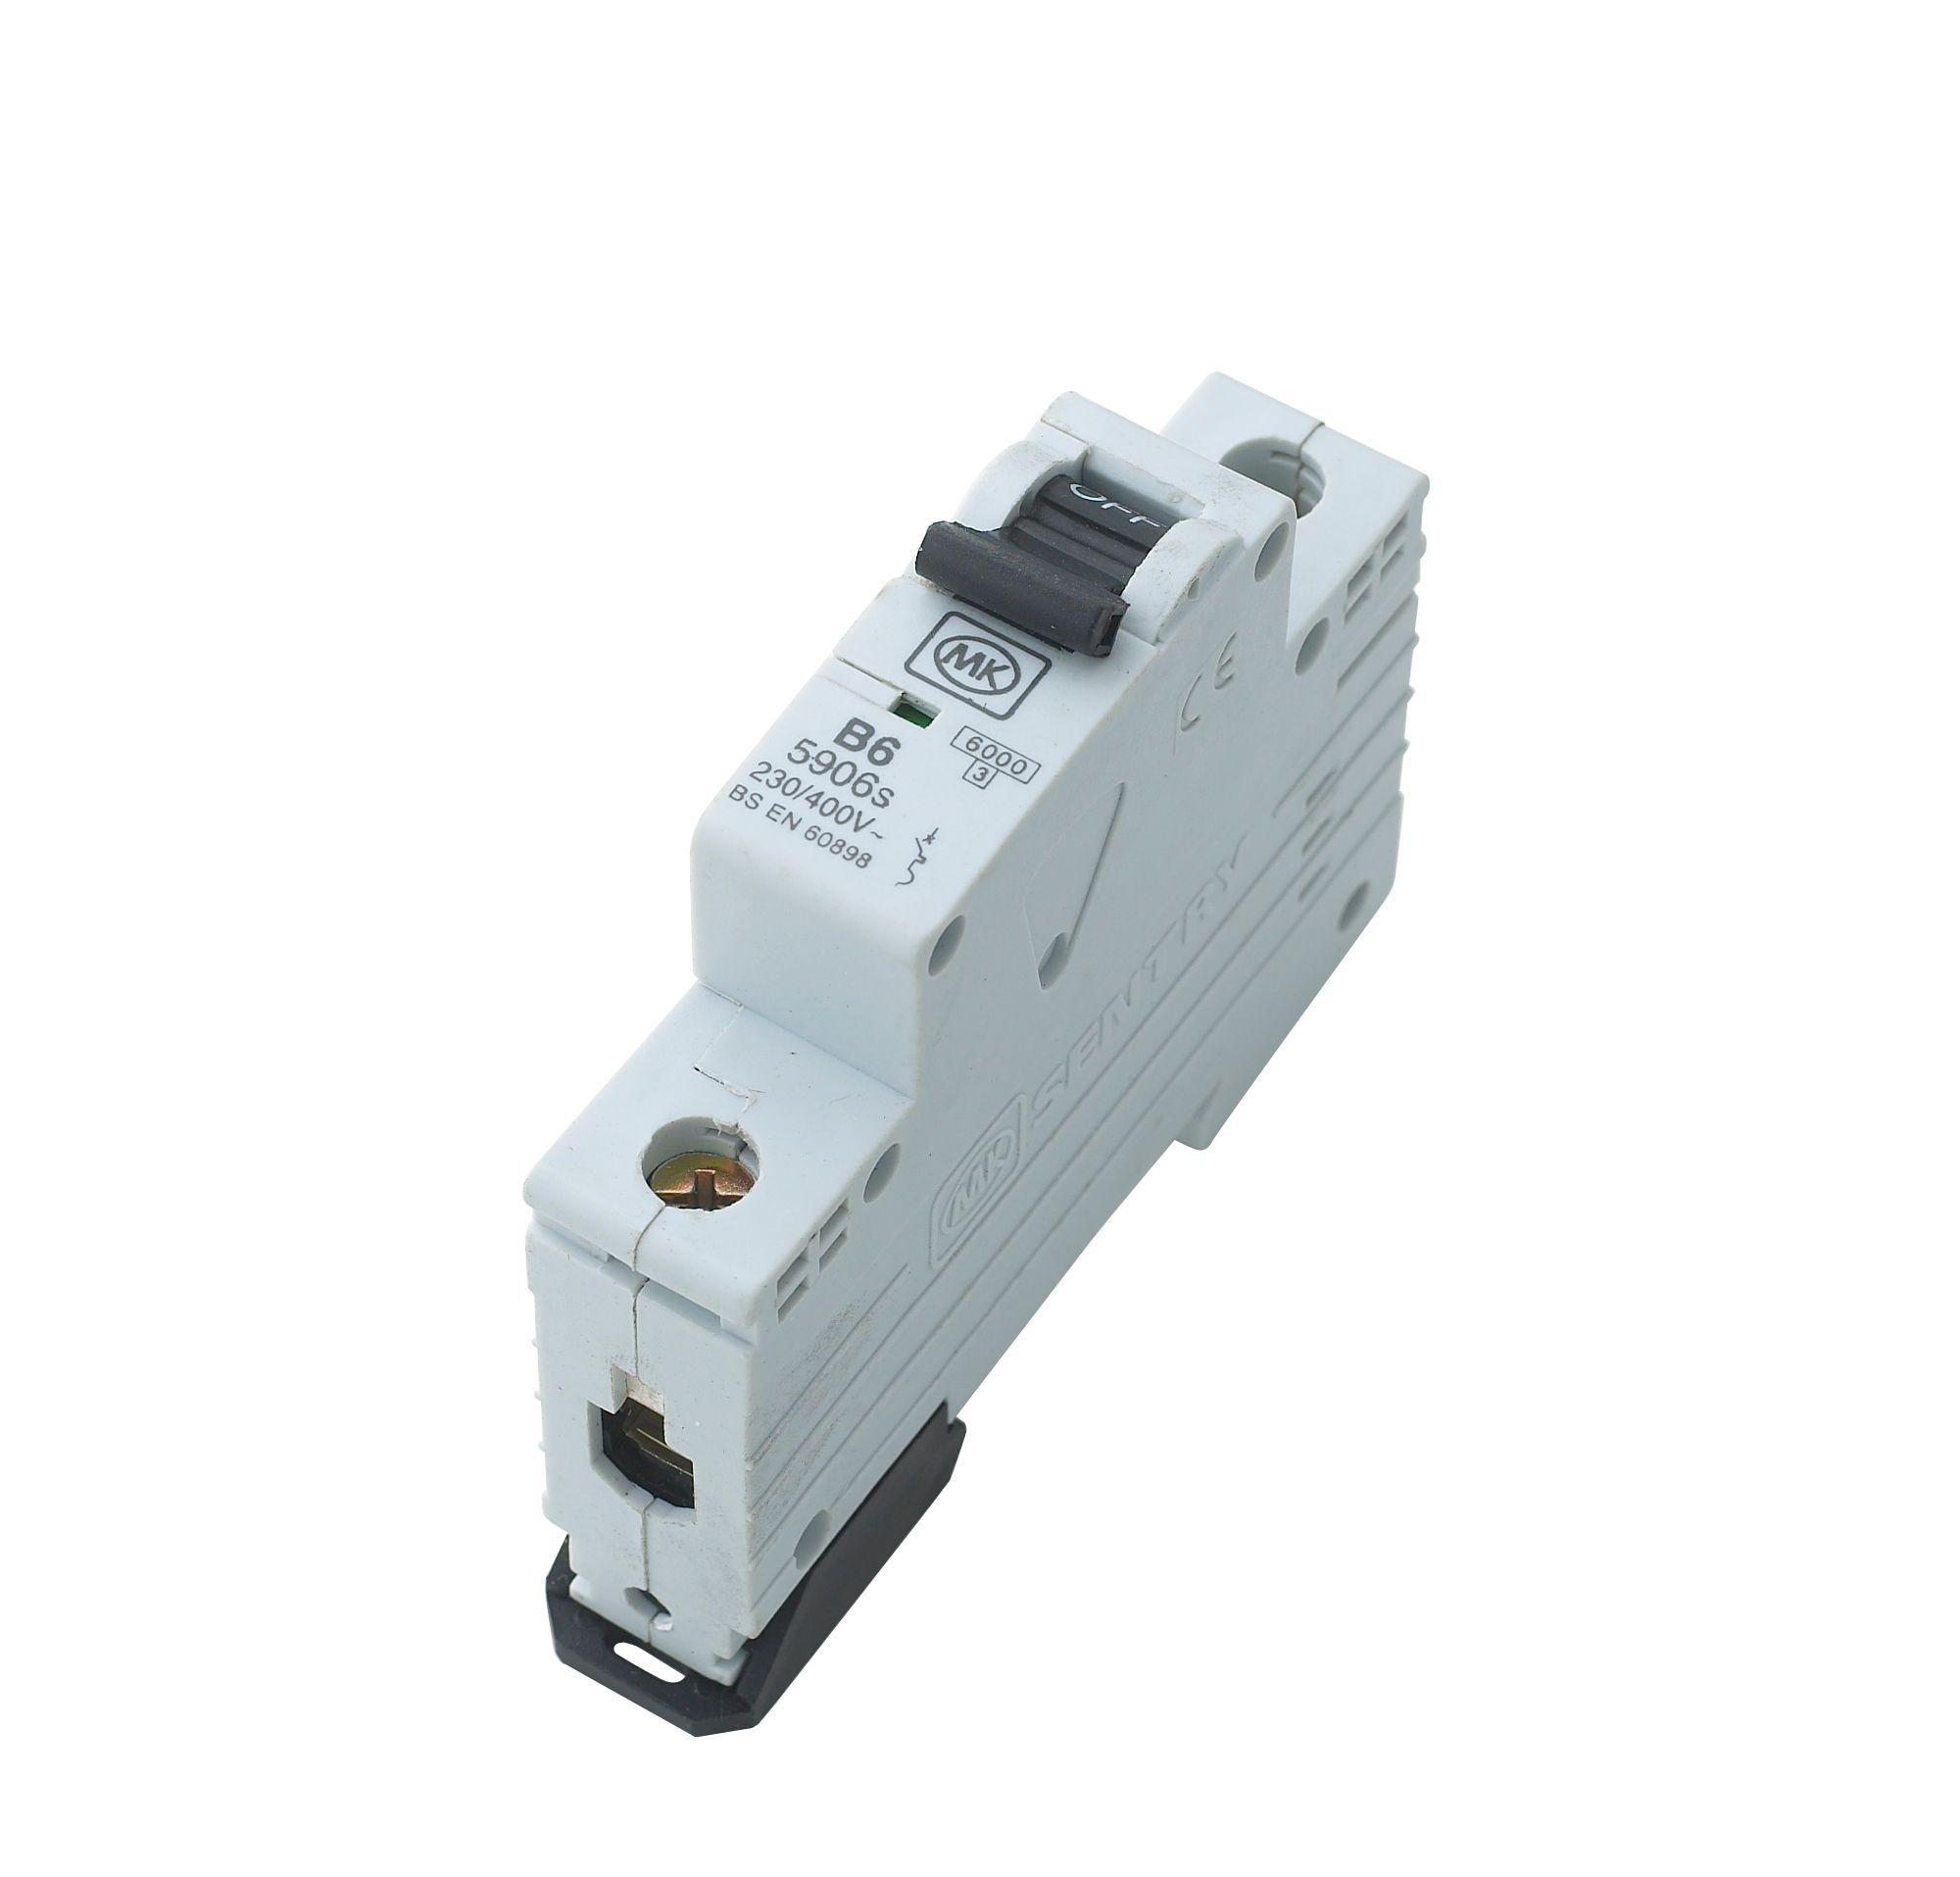 MK 6A MCB (Miniature Circuit Breaker) | Departments | DIY at B&Q